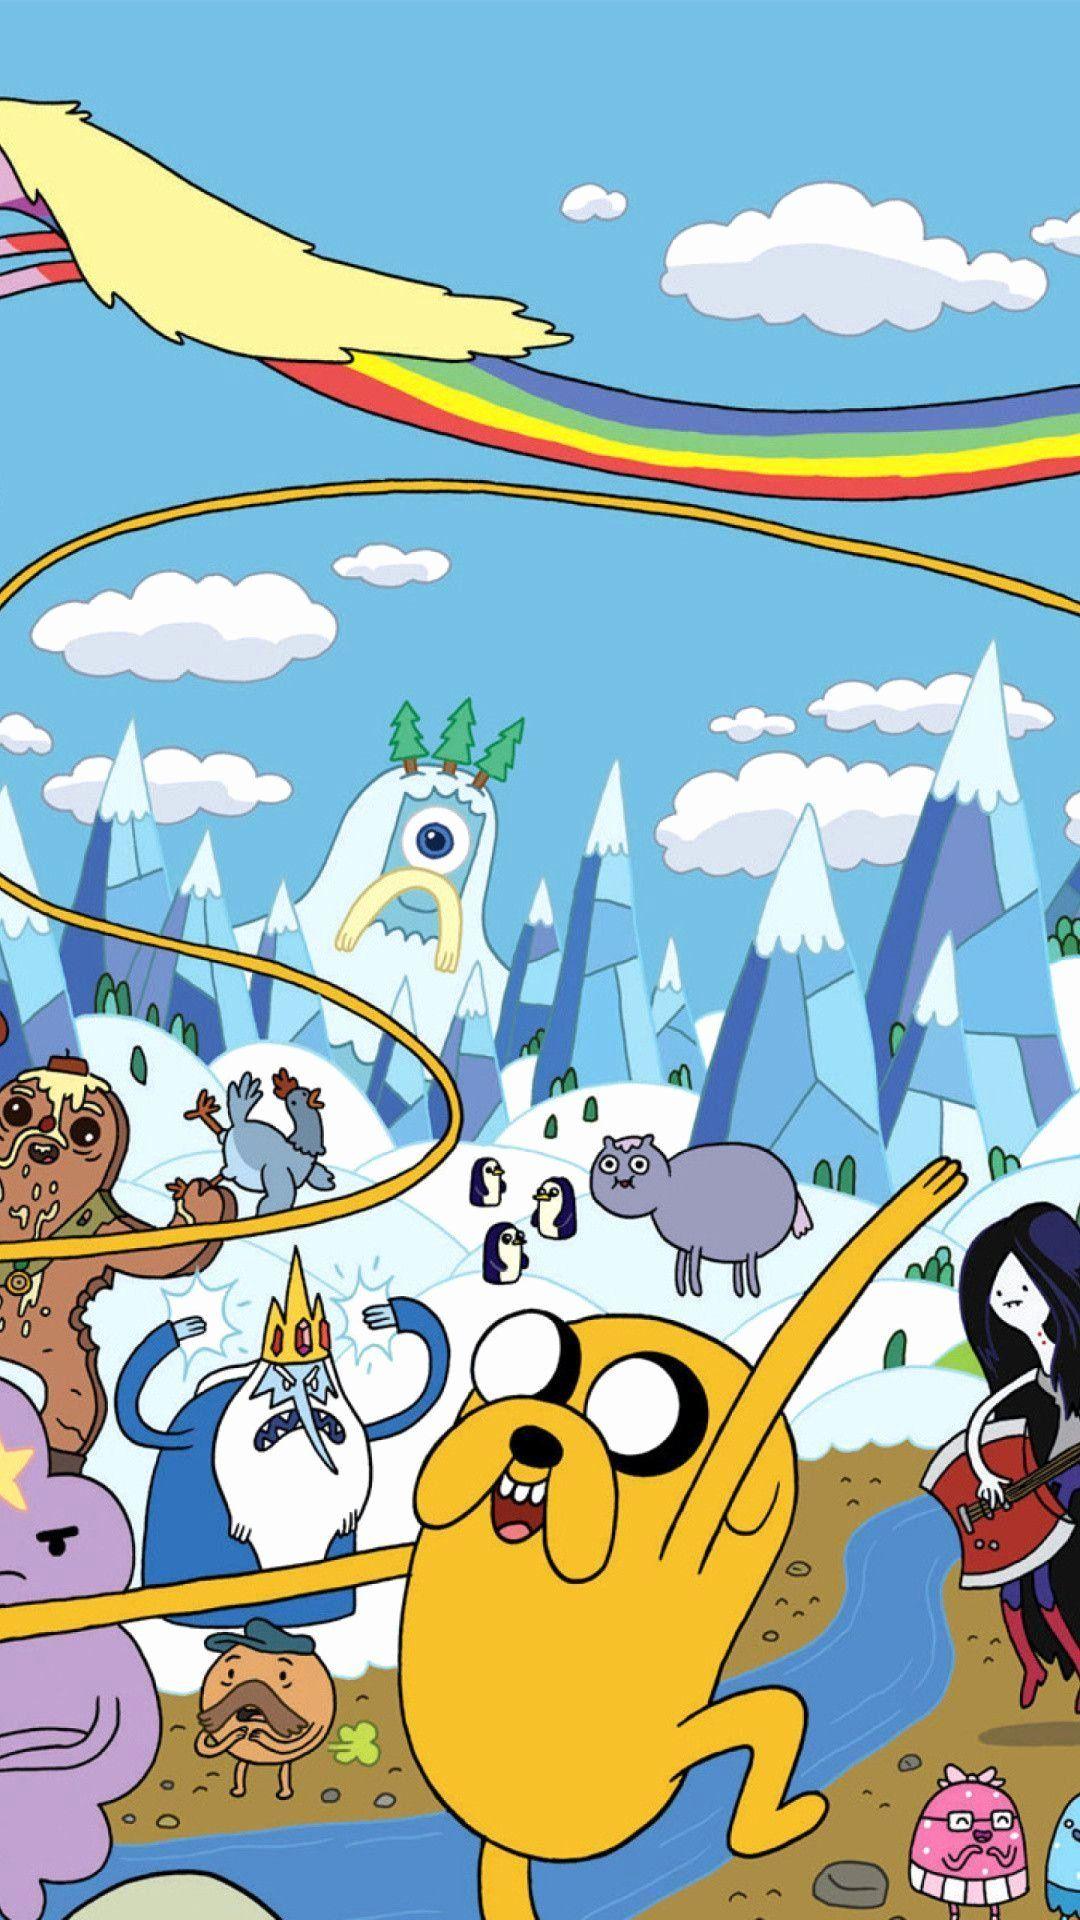 Adventure Time Wallpaper Hd Download Beautiful Aesthetic Adventure Time Wallp Adventure Time Wallpaper Adventure Time Iphone Wallpaper Cartoon Wallpaper Iphone